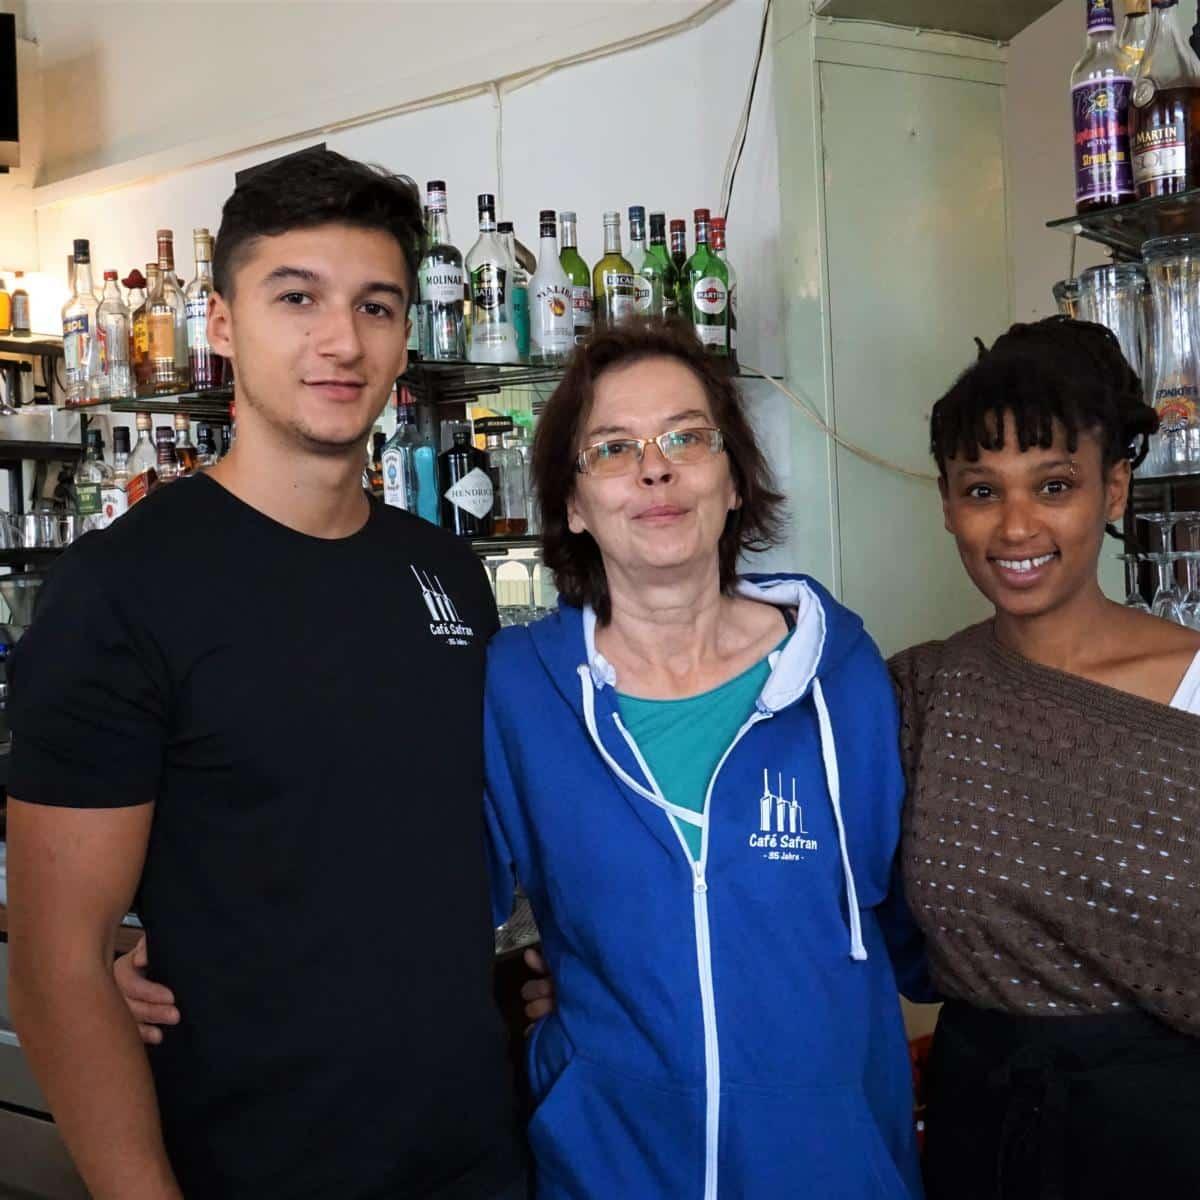 Style Hannover Cafe Safran 2 - Café Safran: Urgestein in Hannovers Gastronomie